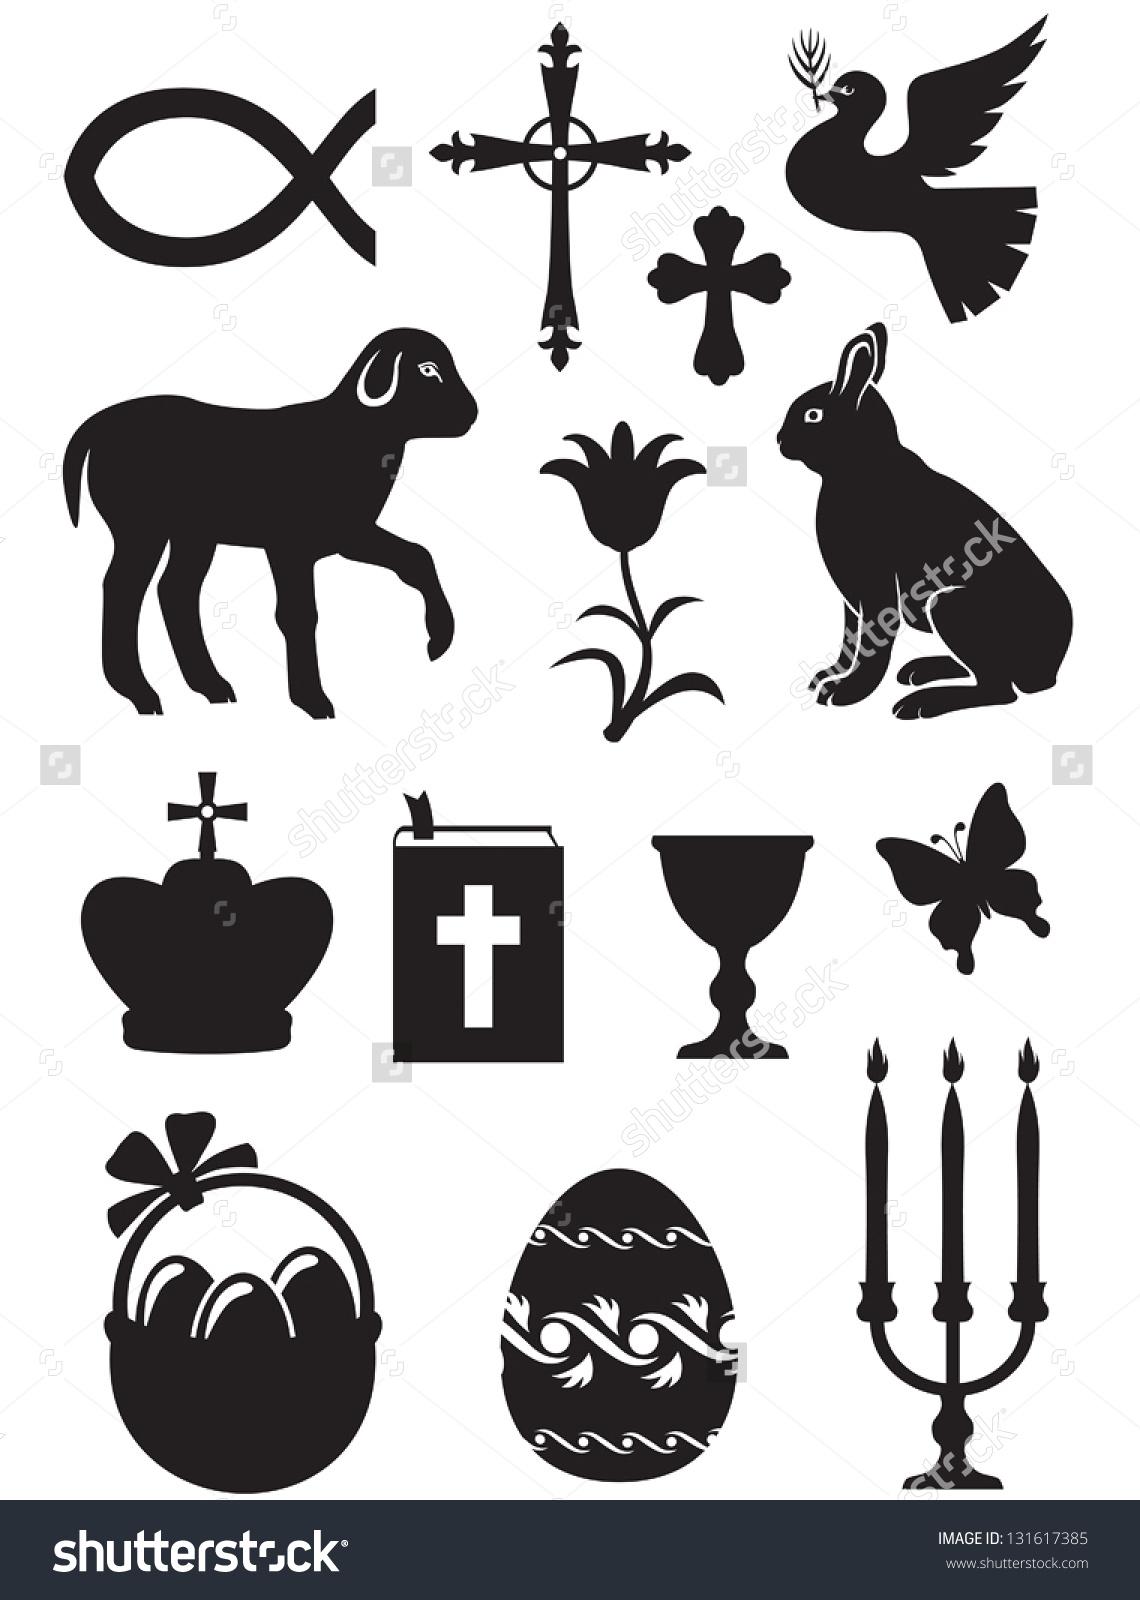 Easter Set Silhouette Black White Images Stock Vector 131617385.